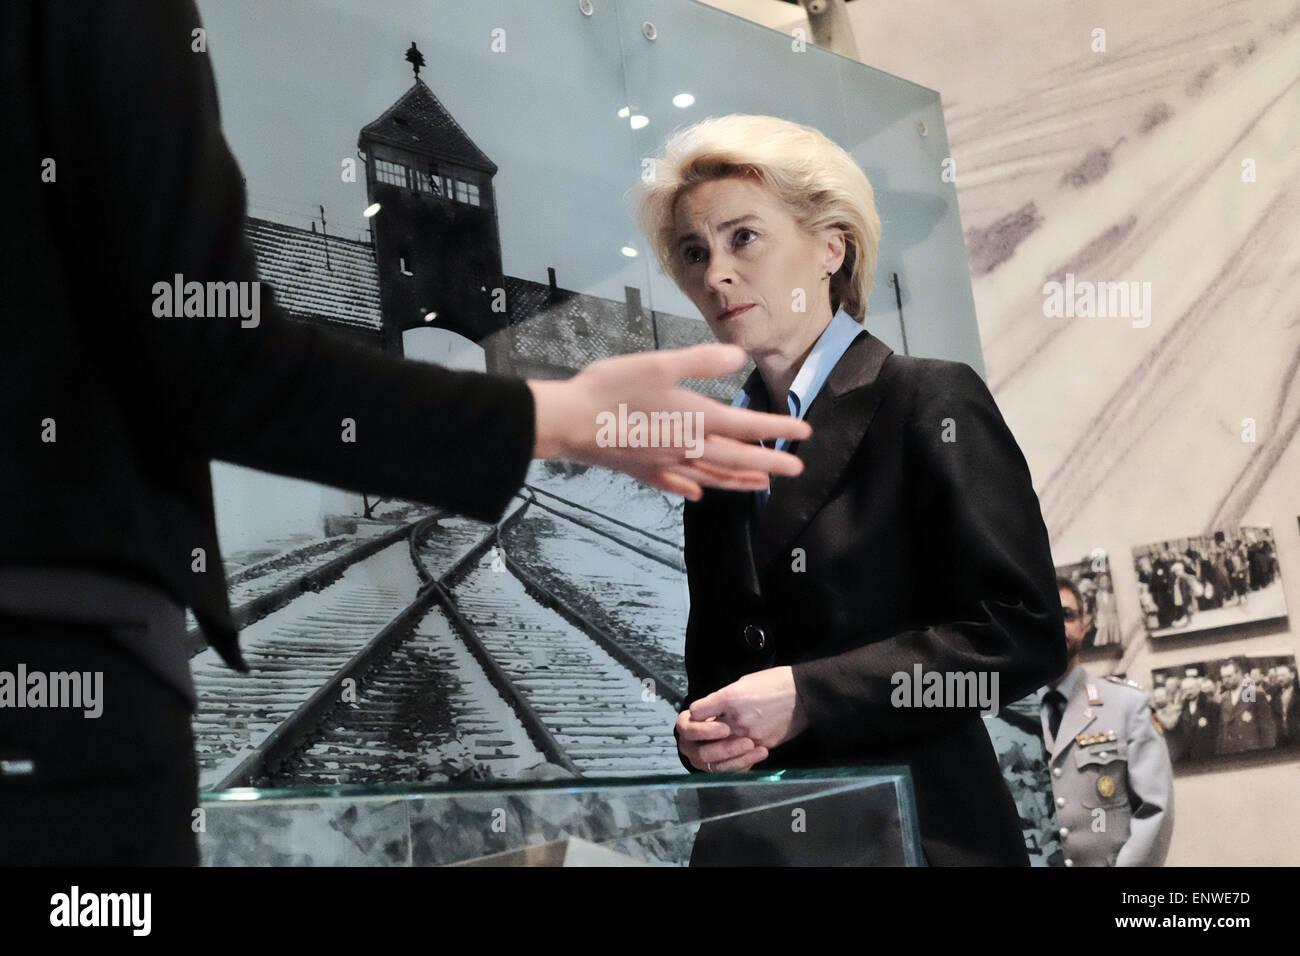 Jerusalem, Israel. 12th May, 2015. Defense Minister of Germany, URSULA VON DER LEYEN (R), views the Auschwitz - - Stock Image